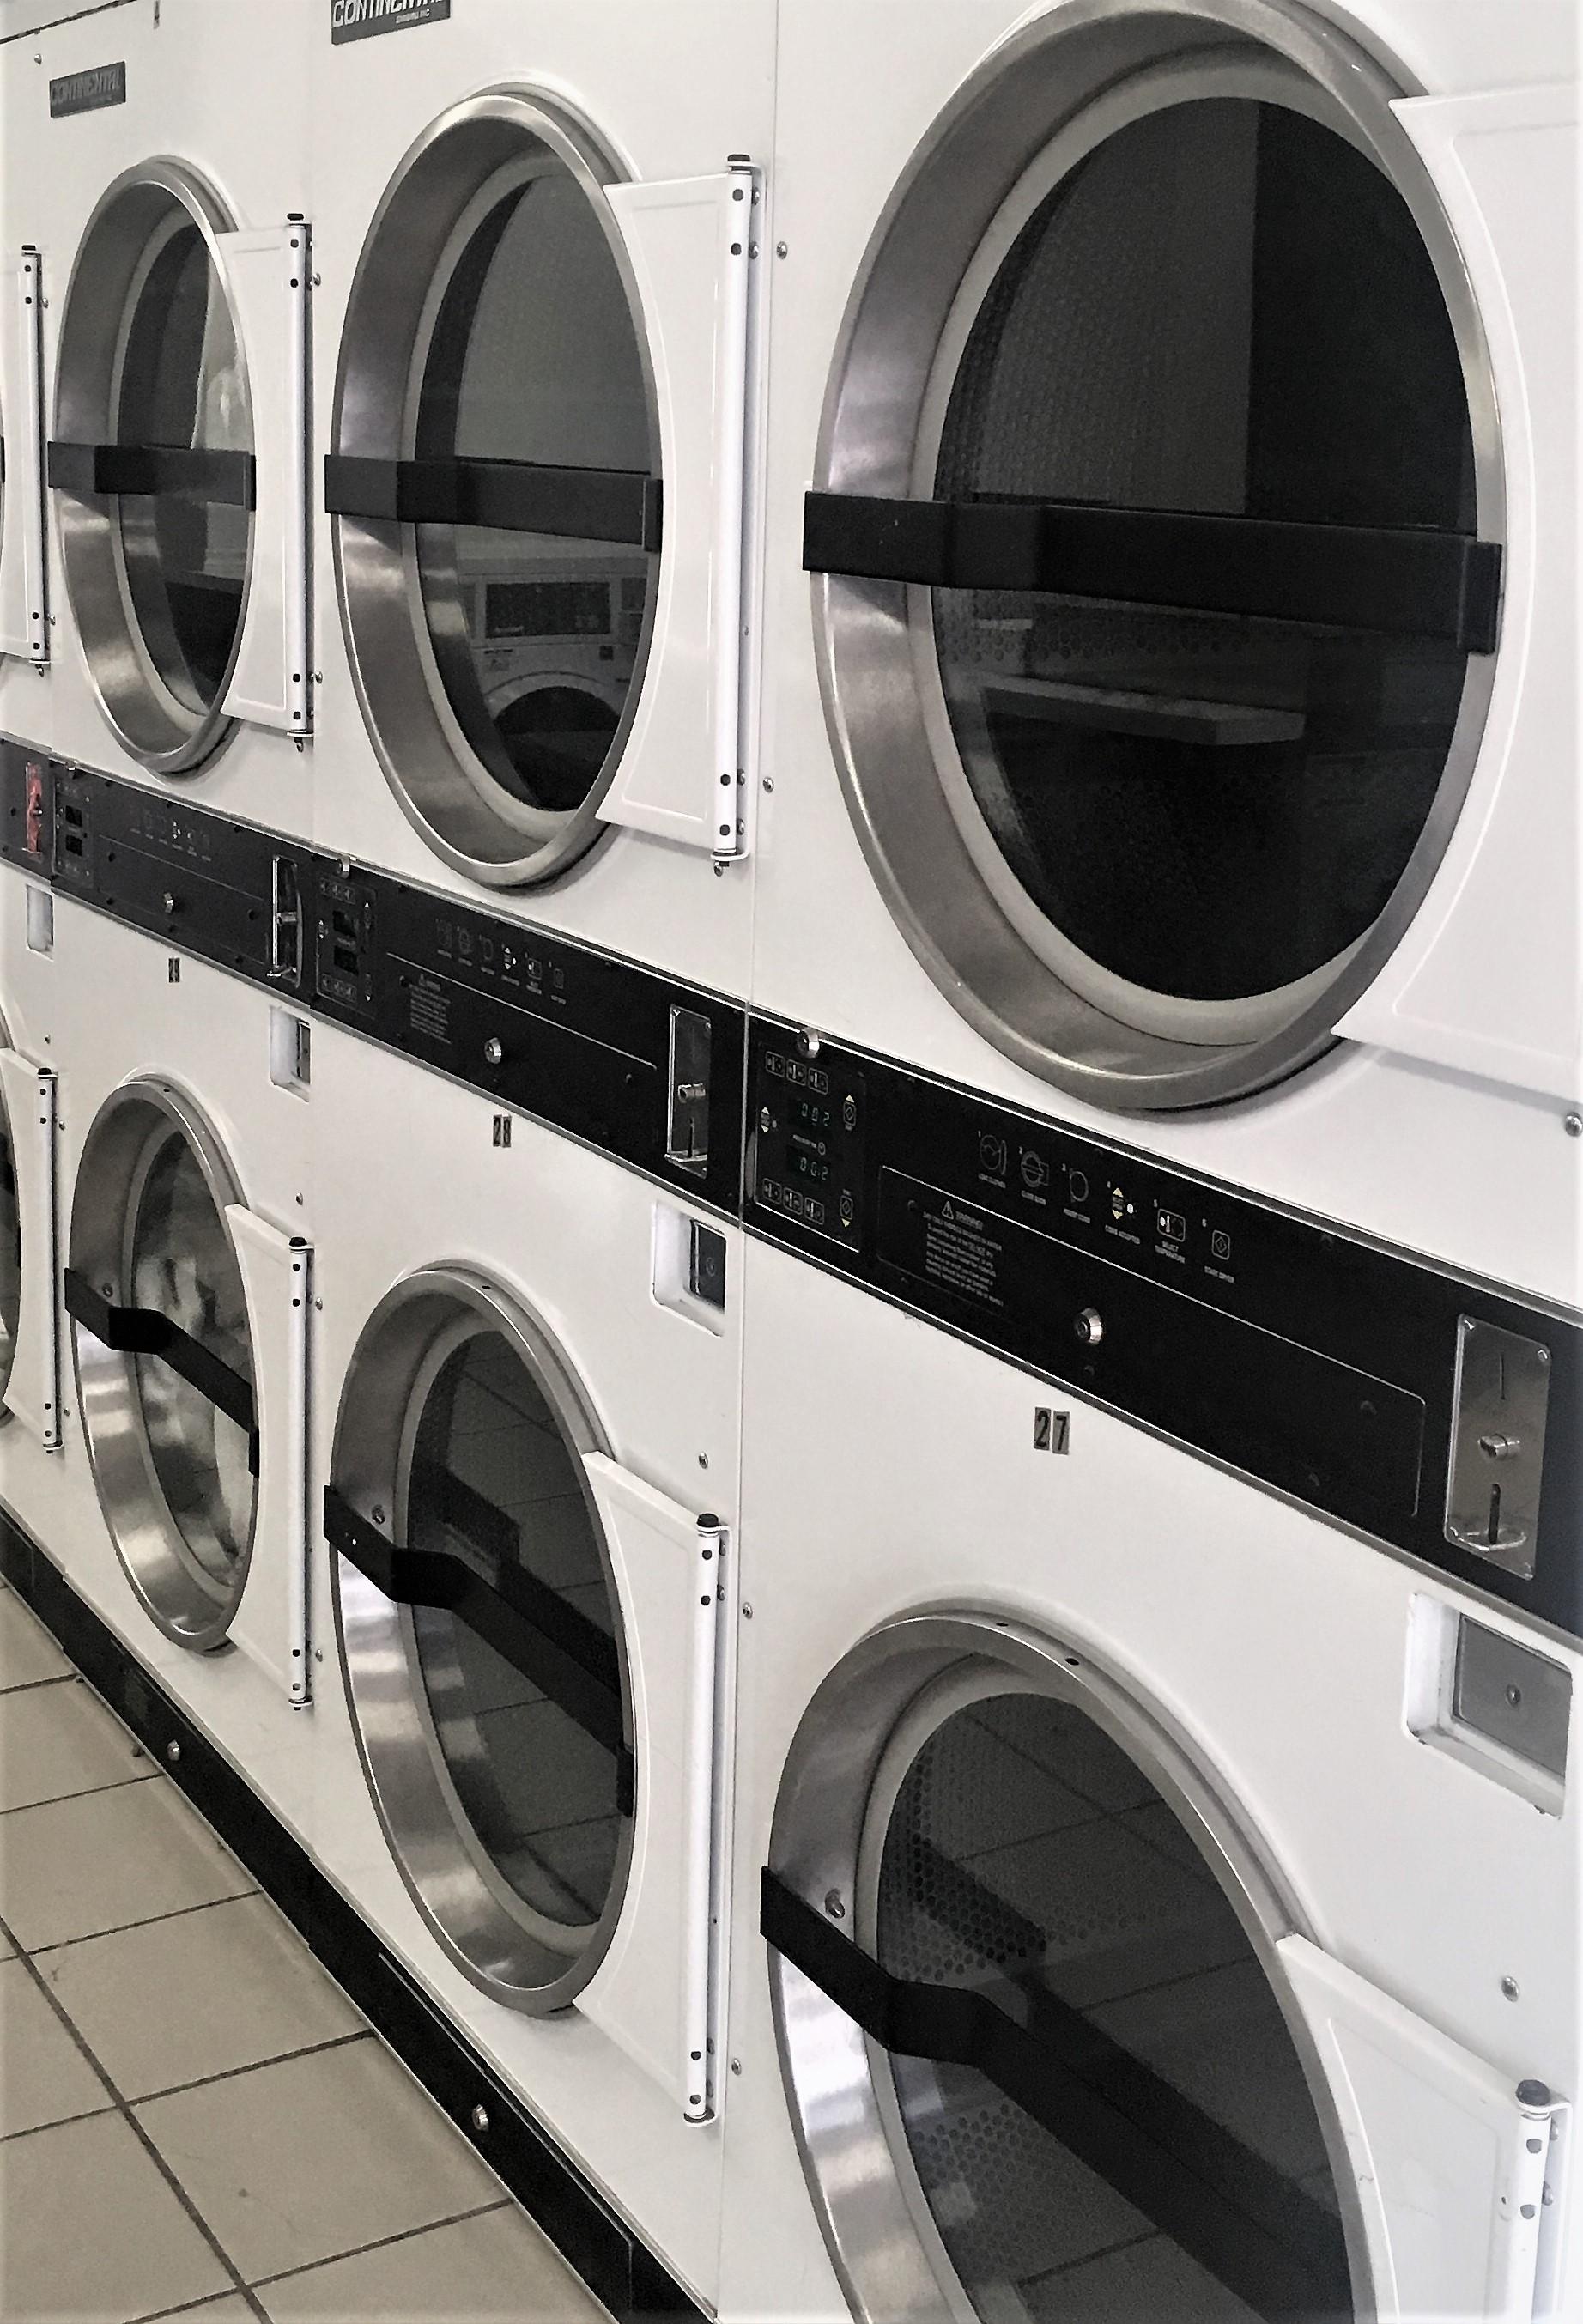 Dryers_092017.JPG